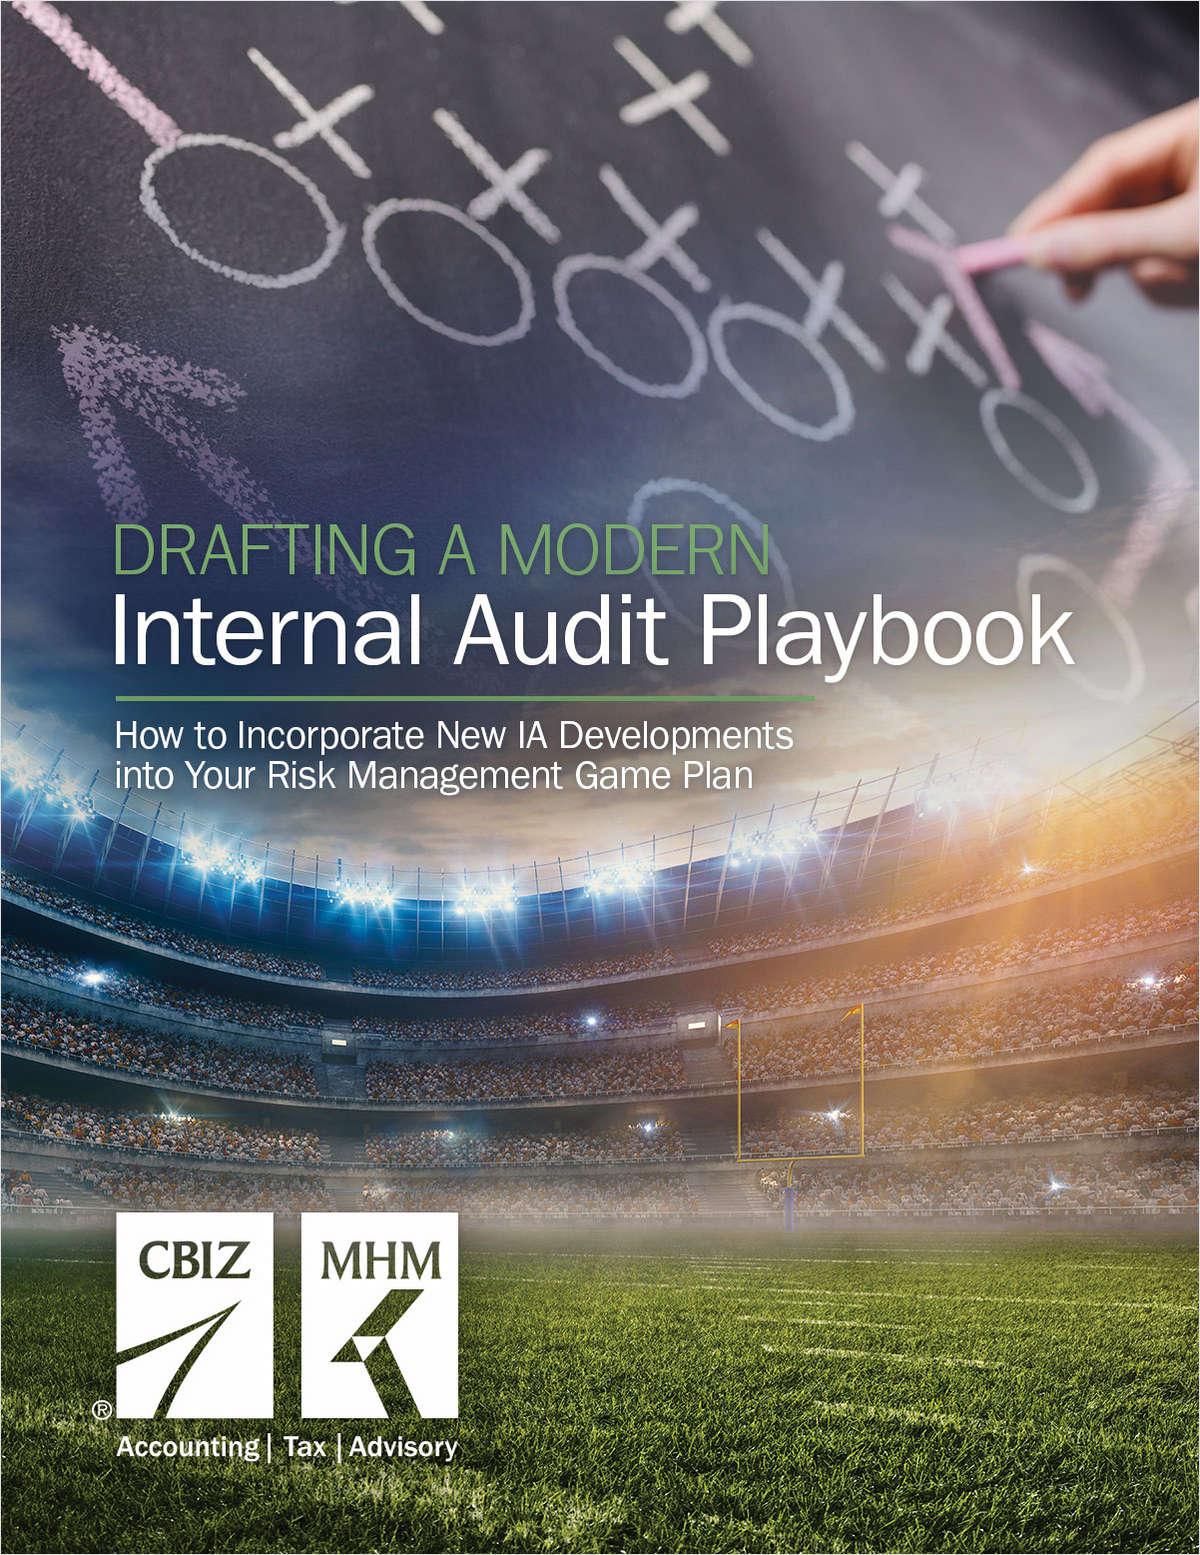 Your Modern Internal Audit Playbook